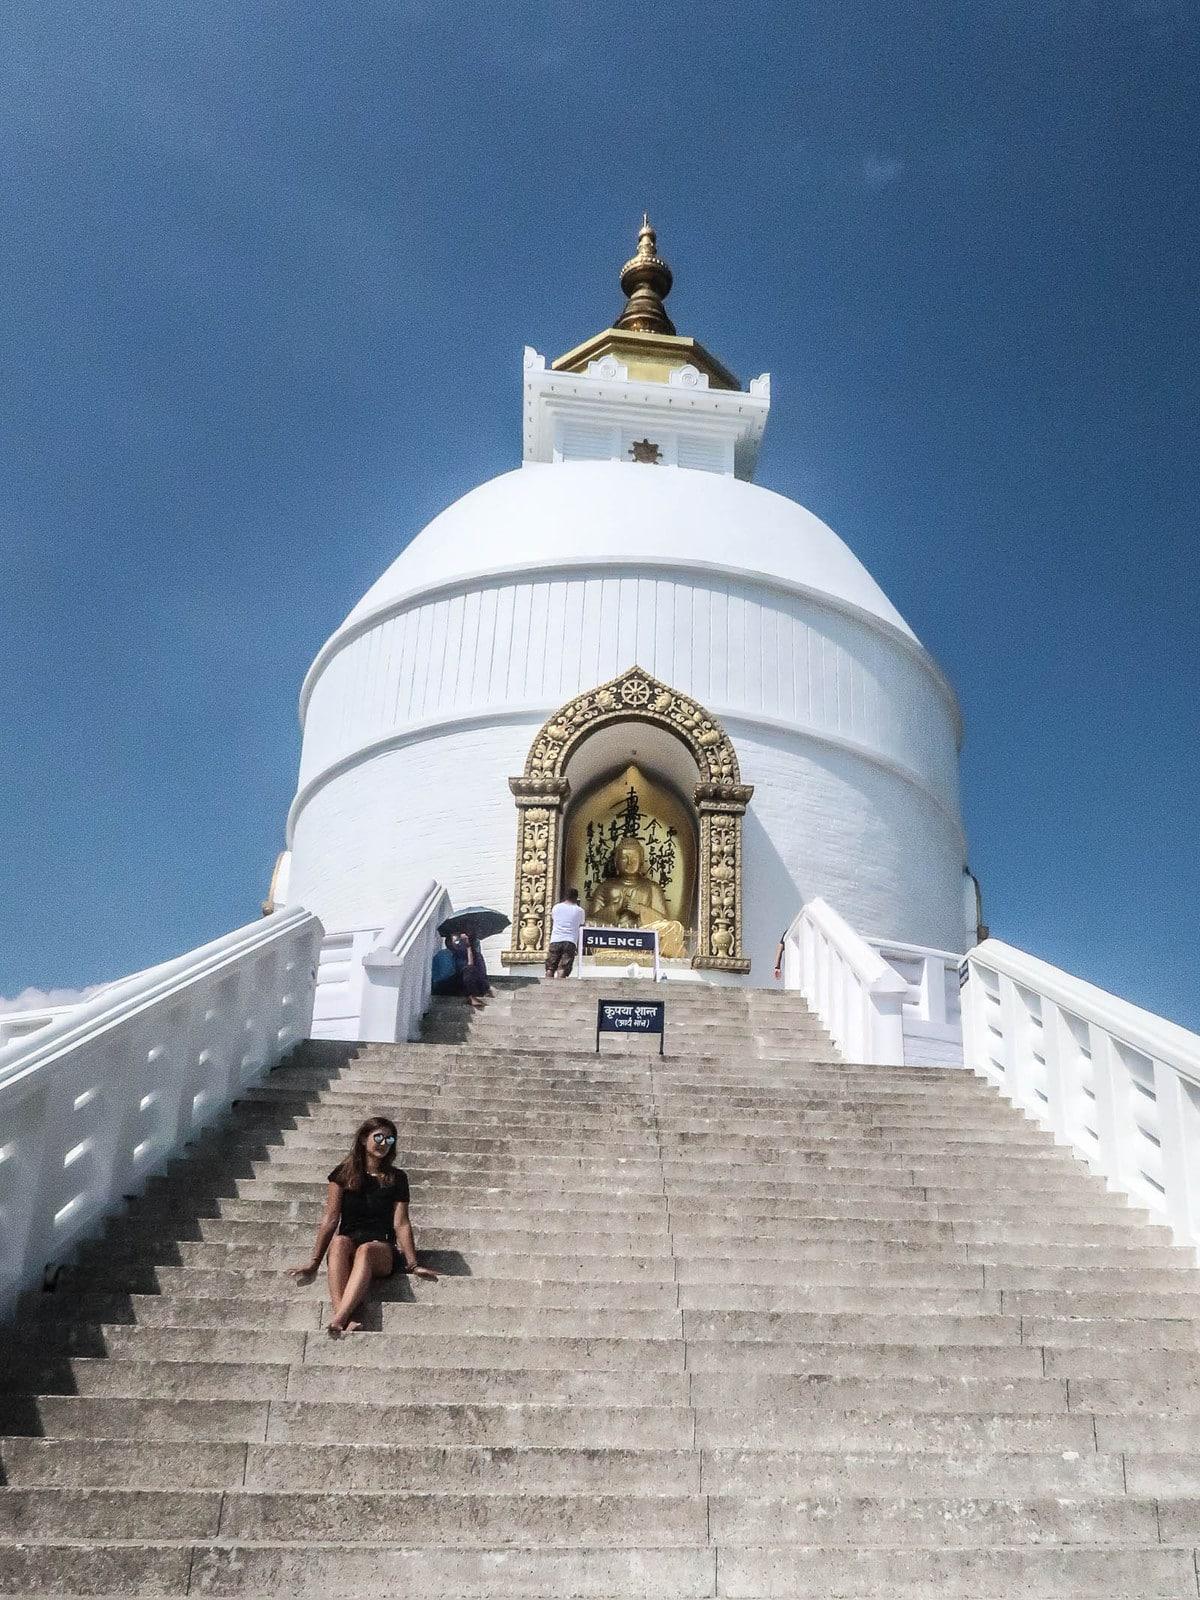 Pokhara World Peace Pagoda, Nepal